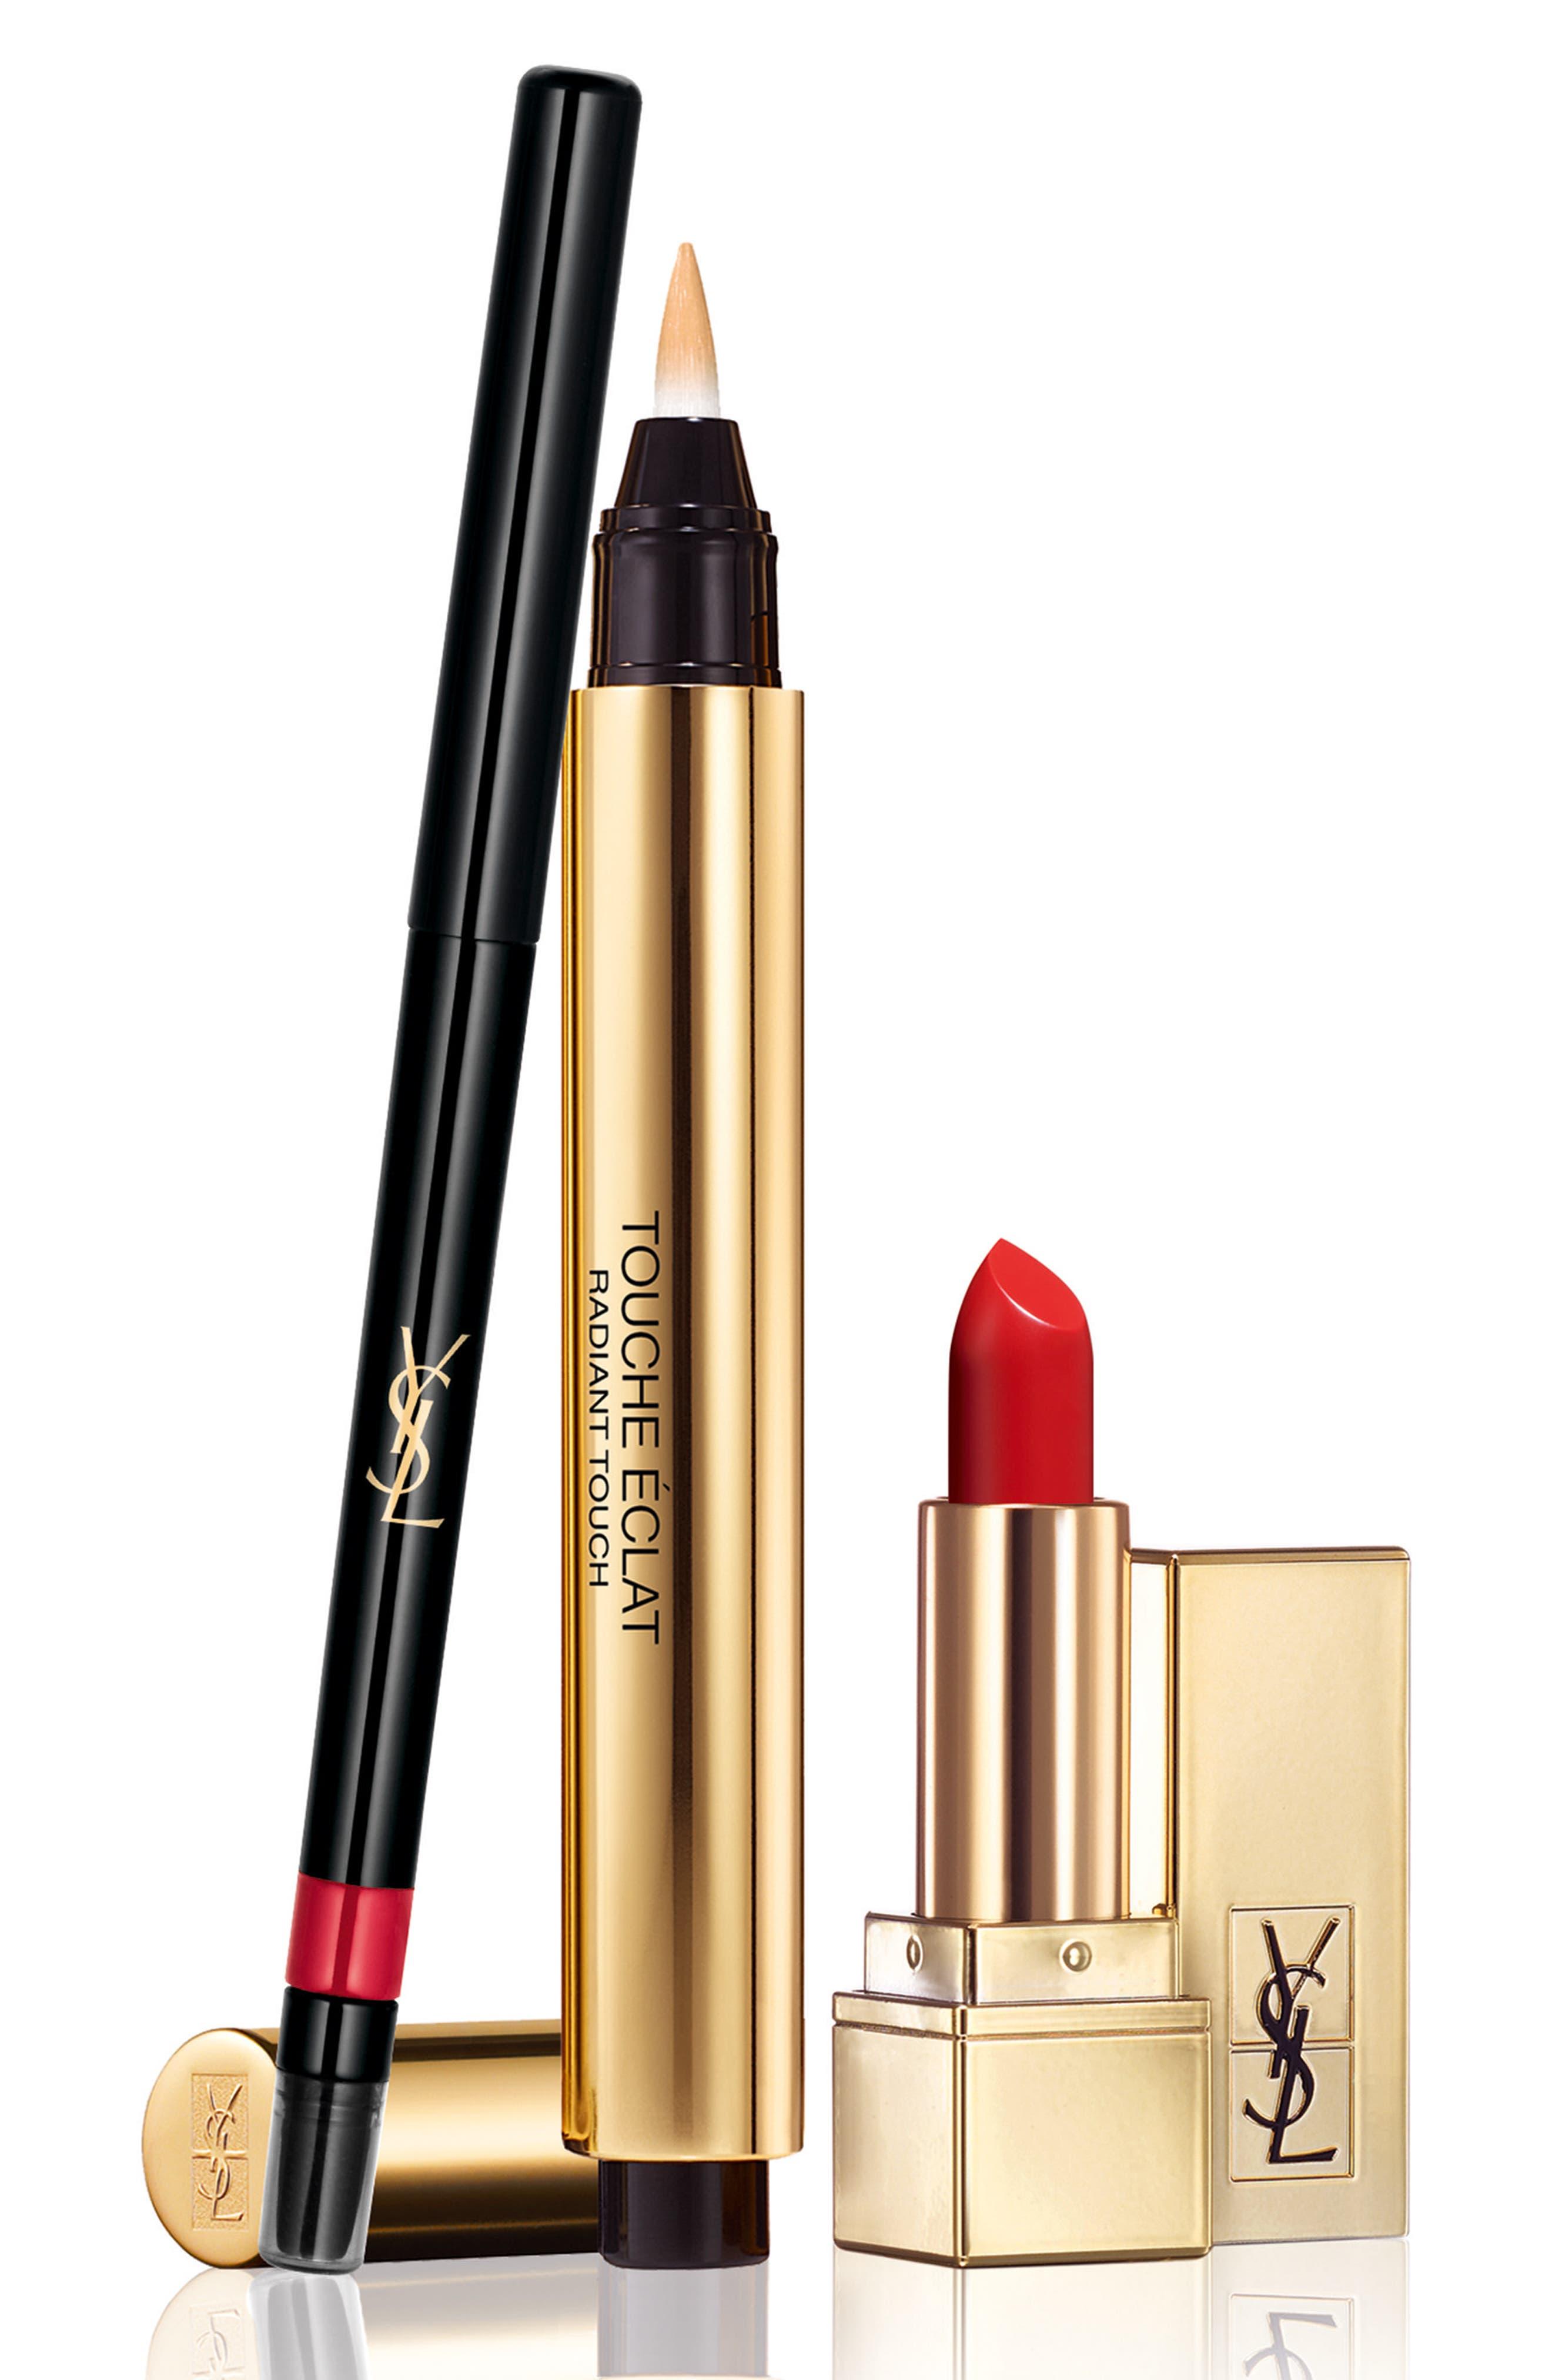 Yves Saint Laurent Lip Essentials Kit ($91 Value)